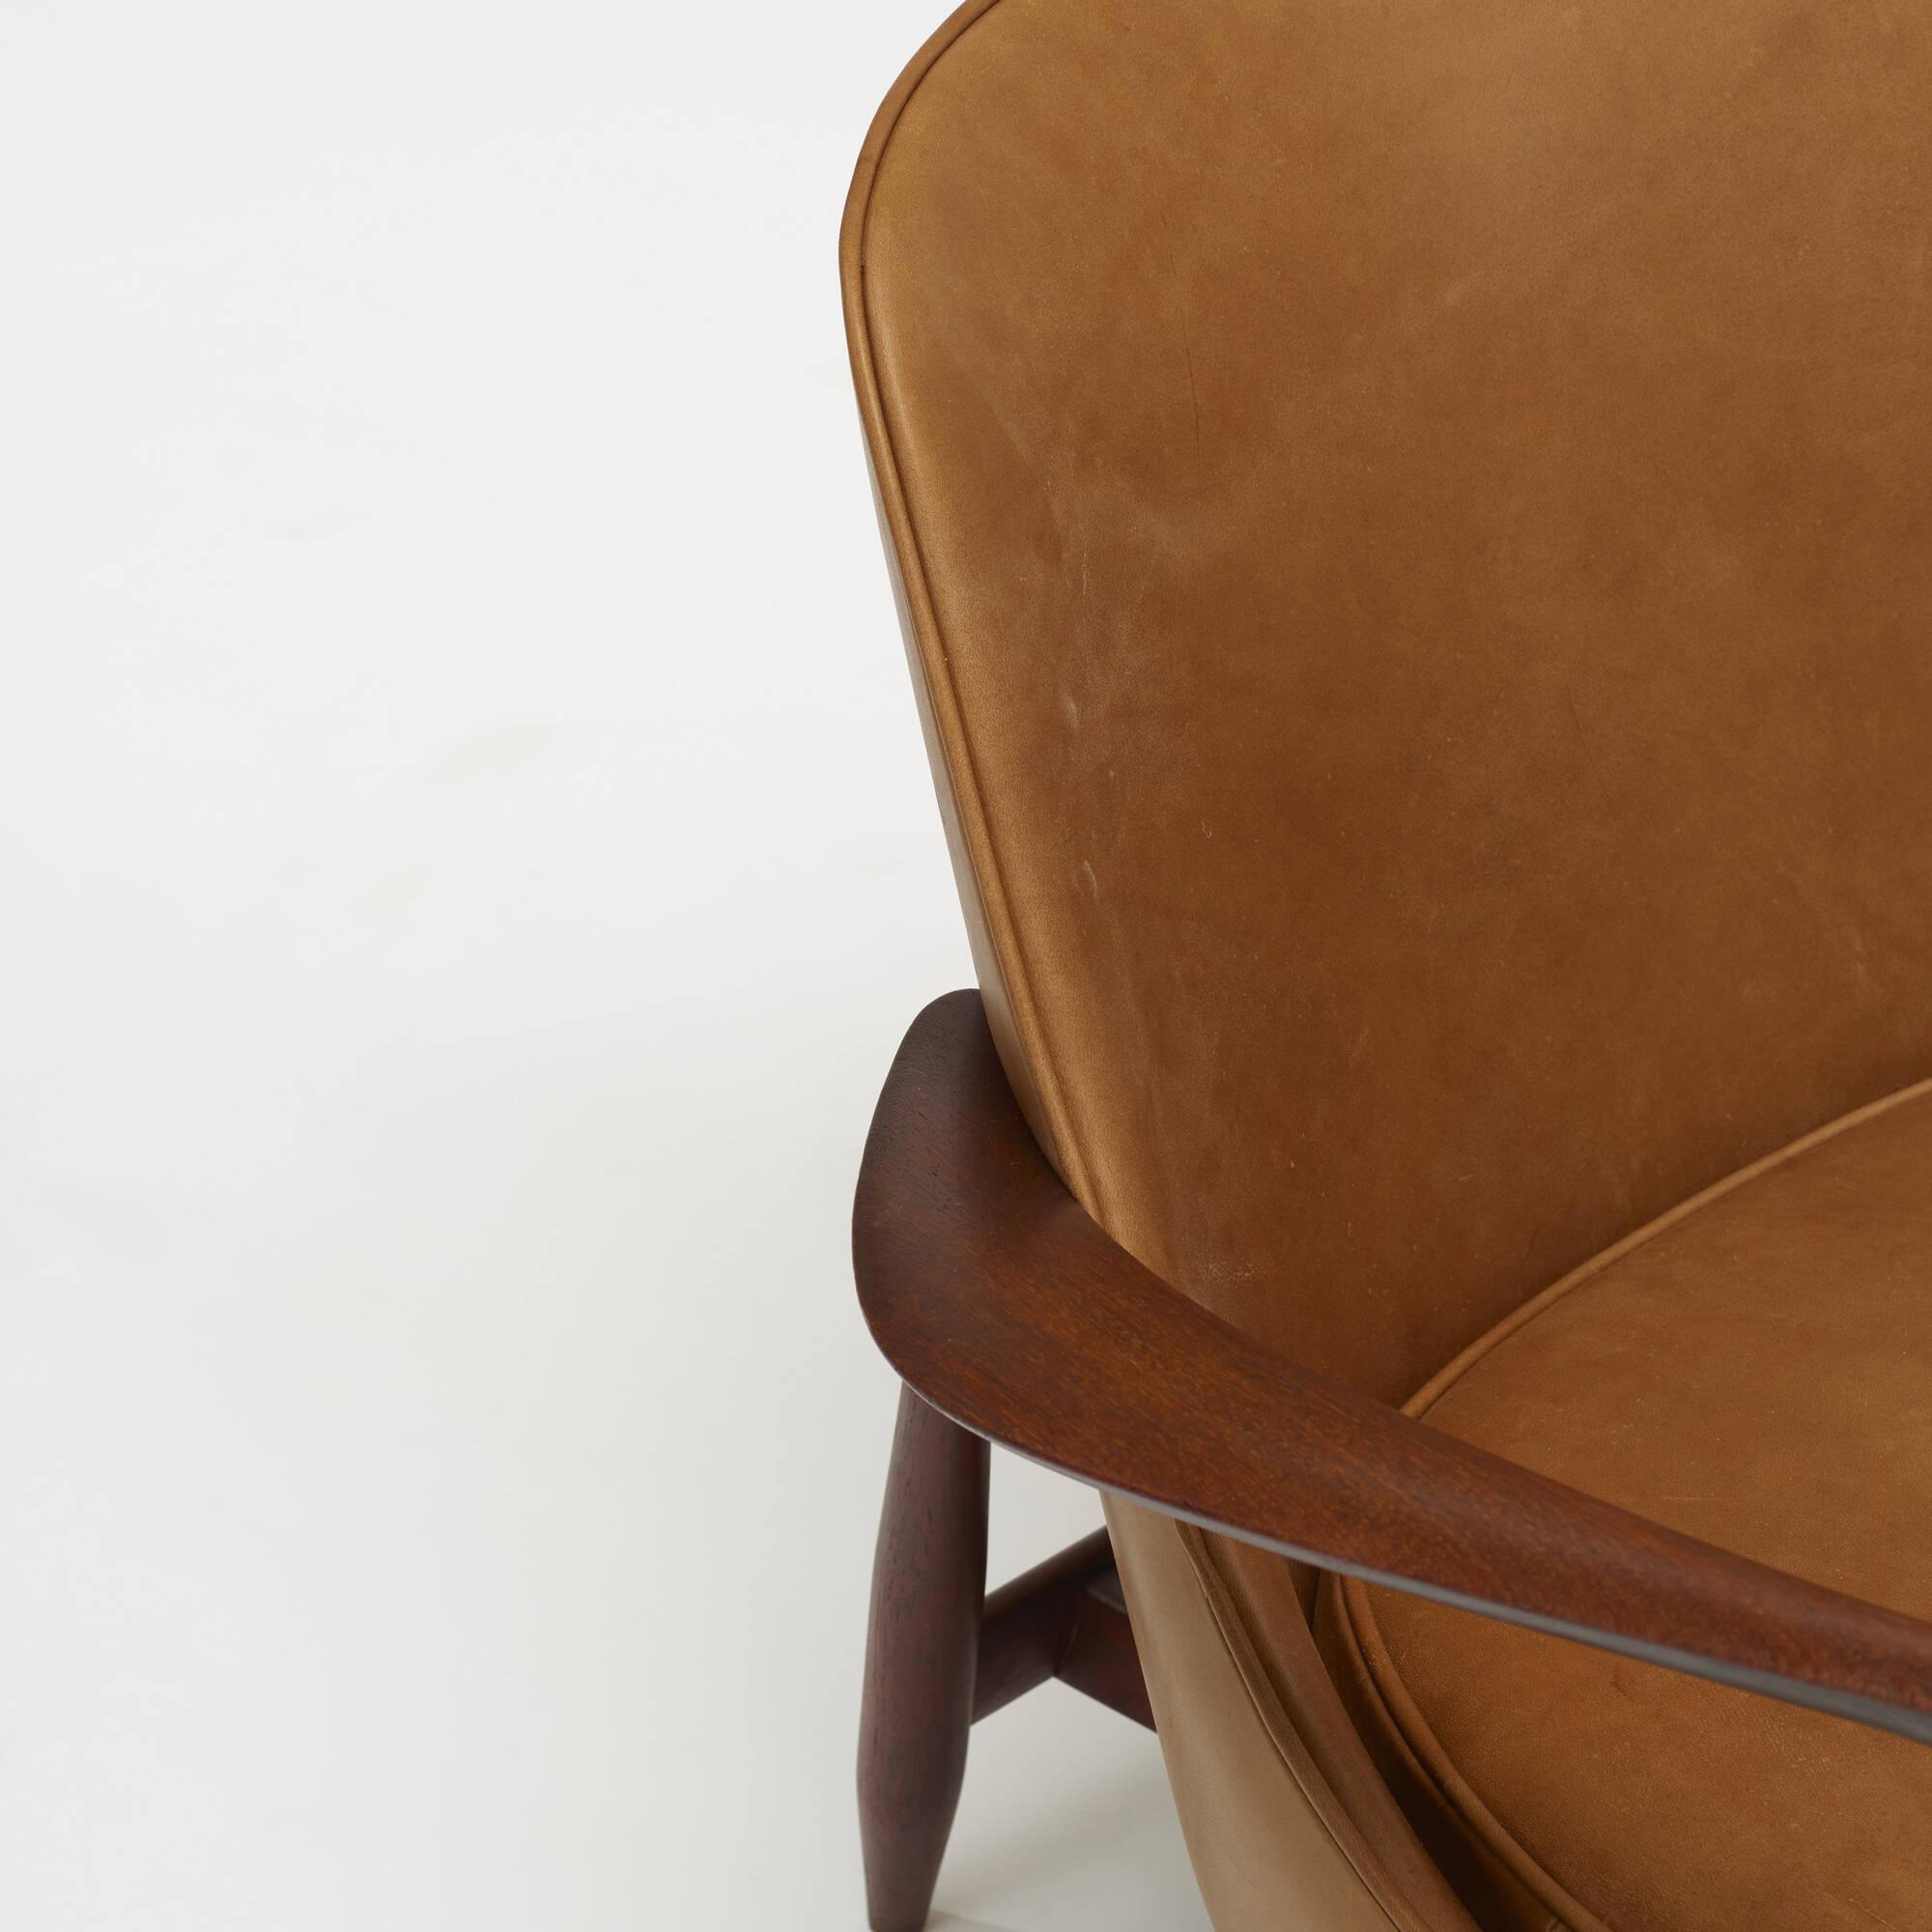 372: Ib Kofod-Larsen / Elizabeth chair (3 of 3)